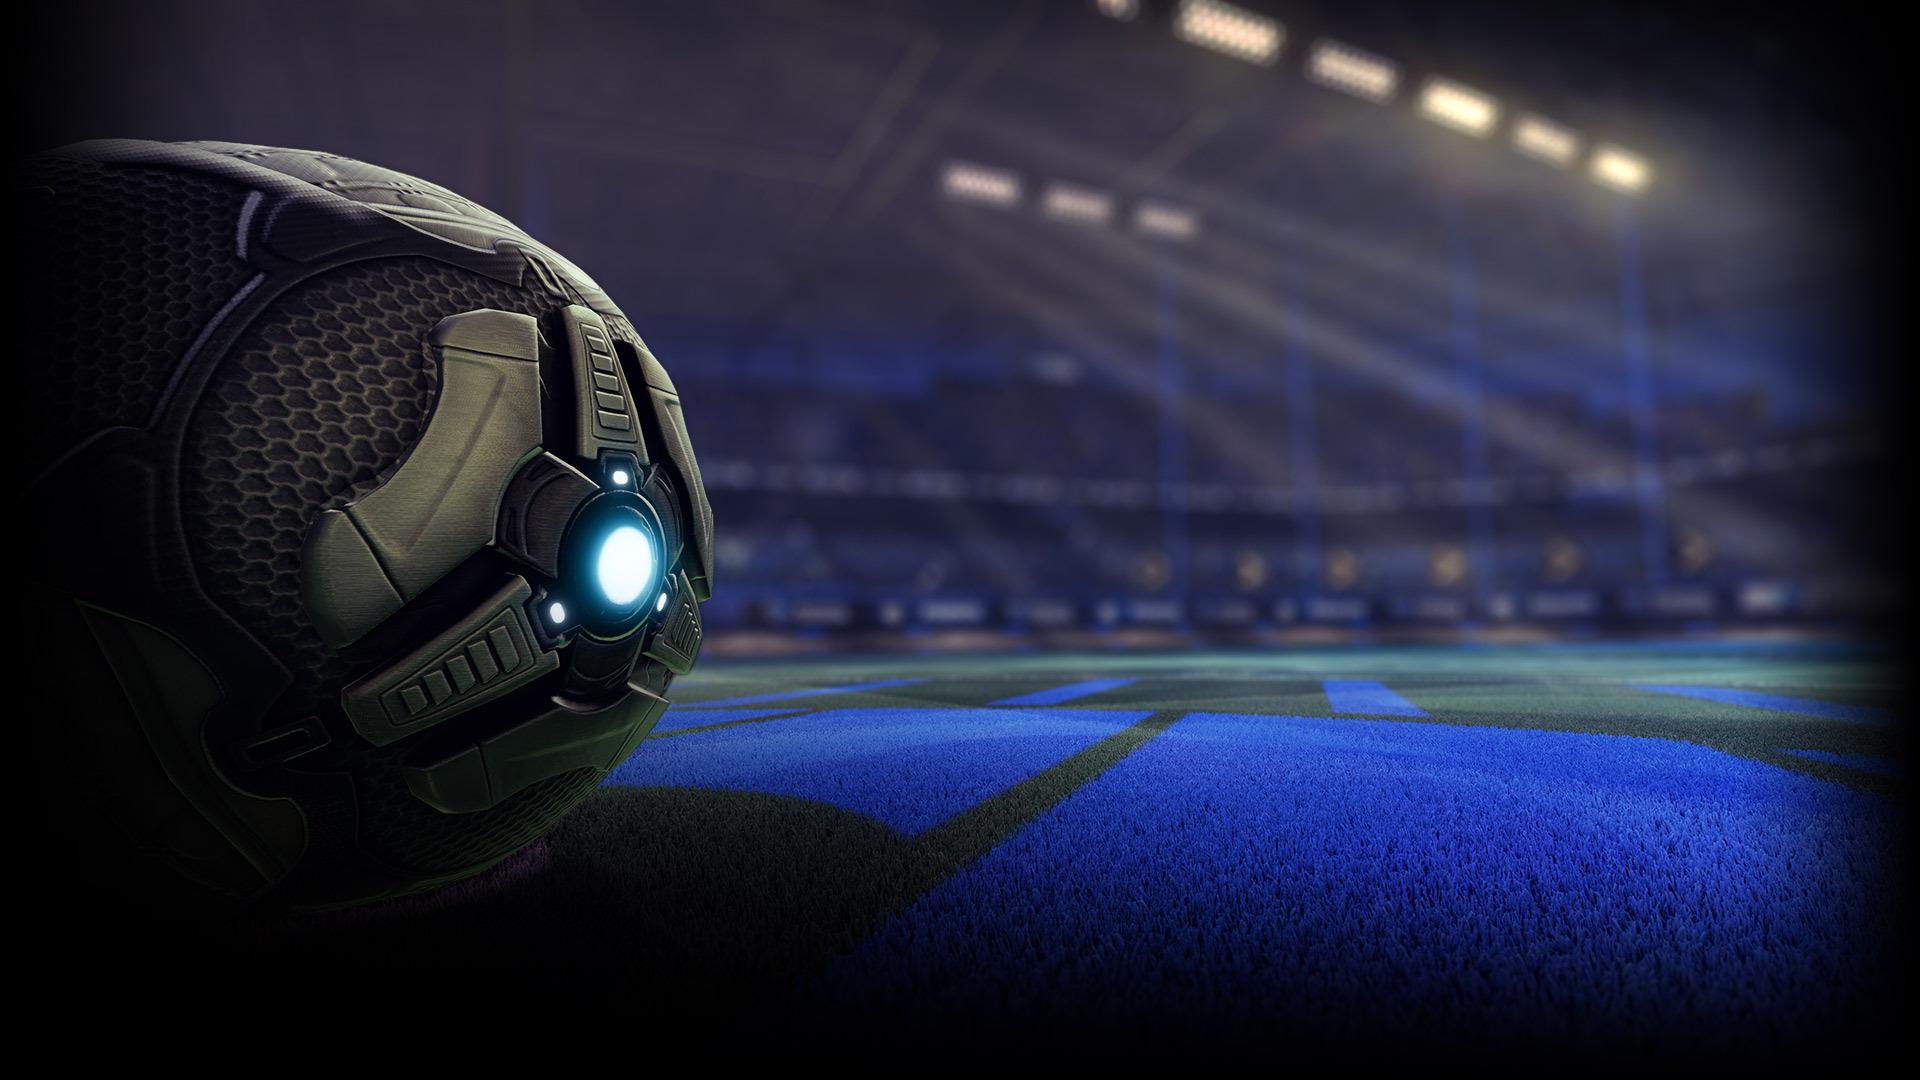 rocket league video game wallpaper 61723